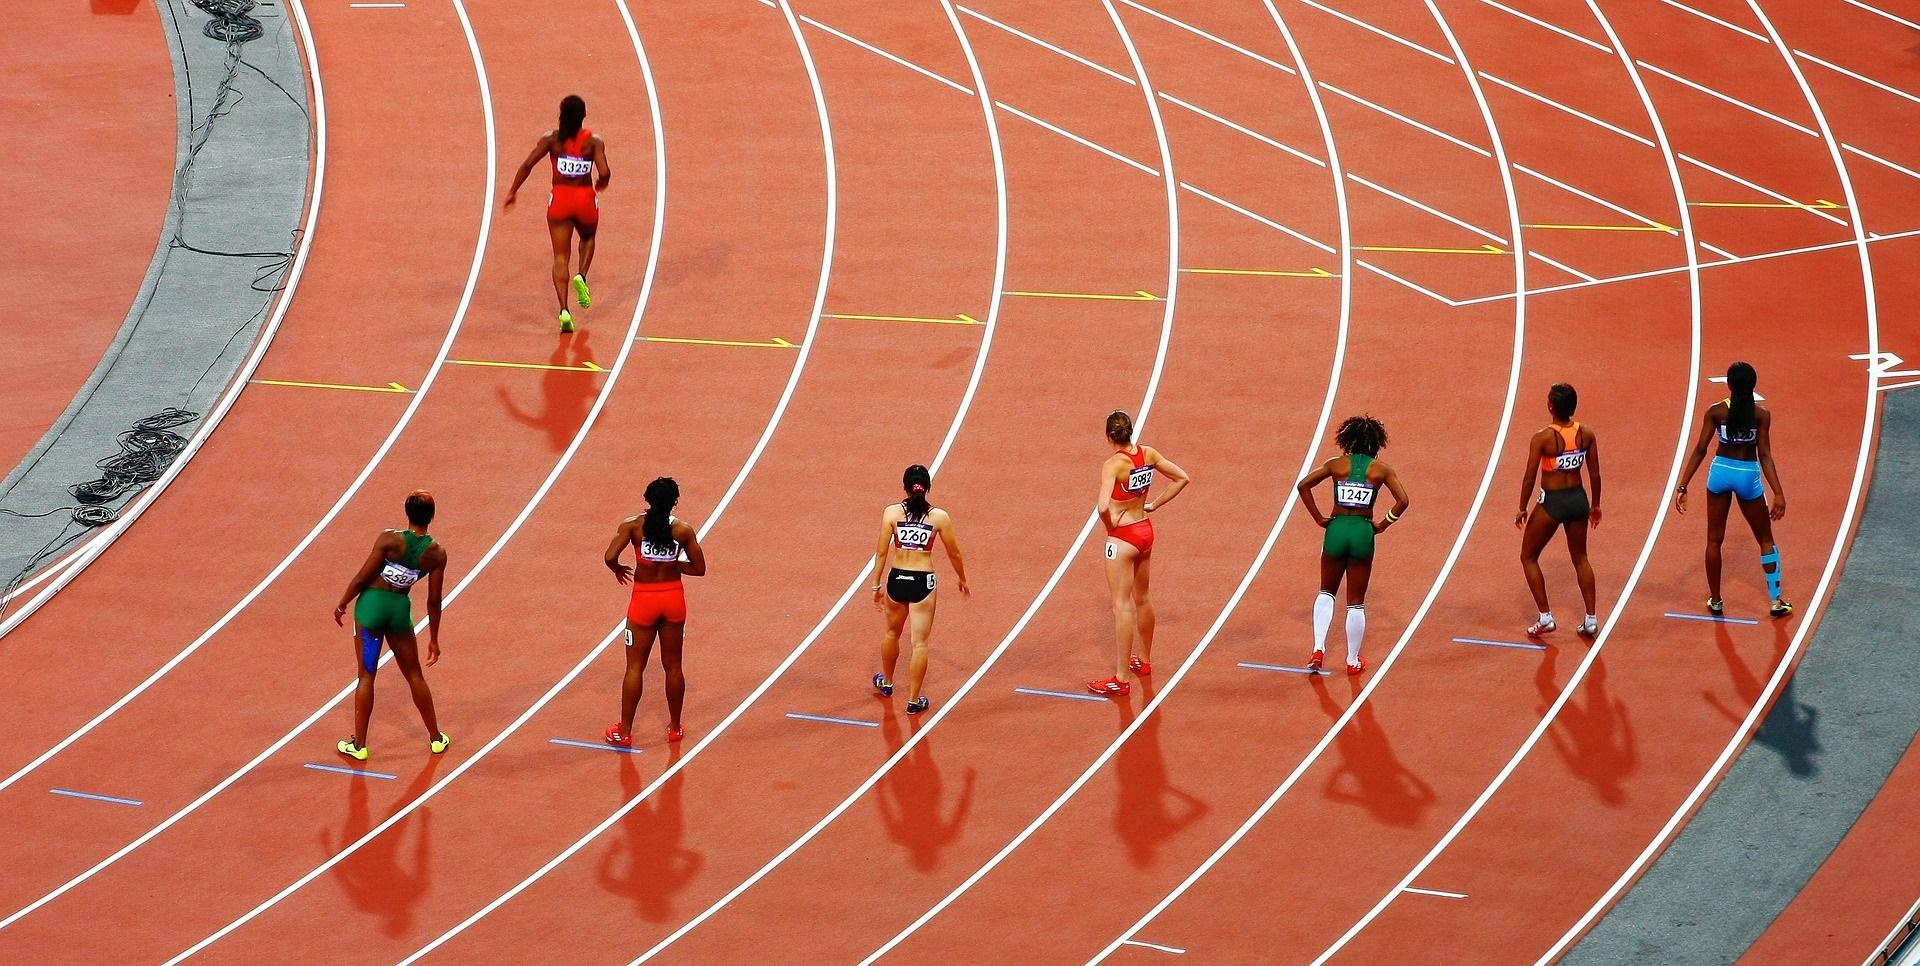 Women Athletes on Running Race Track